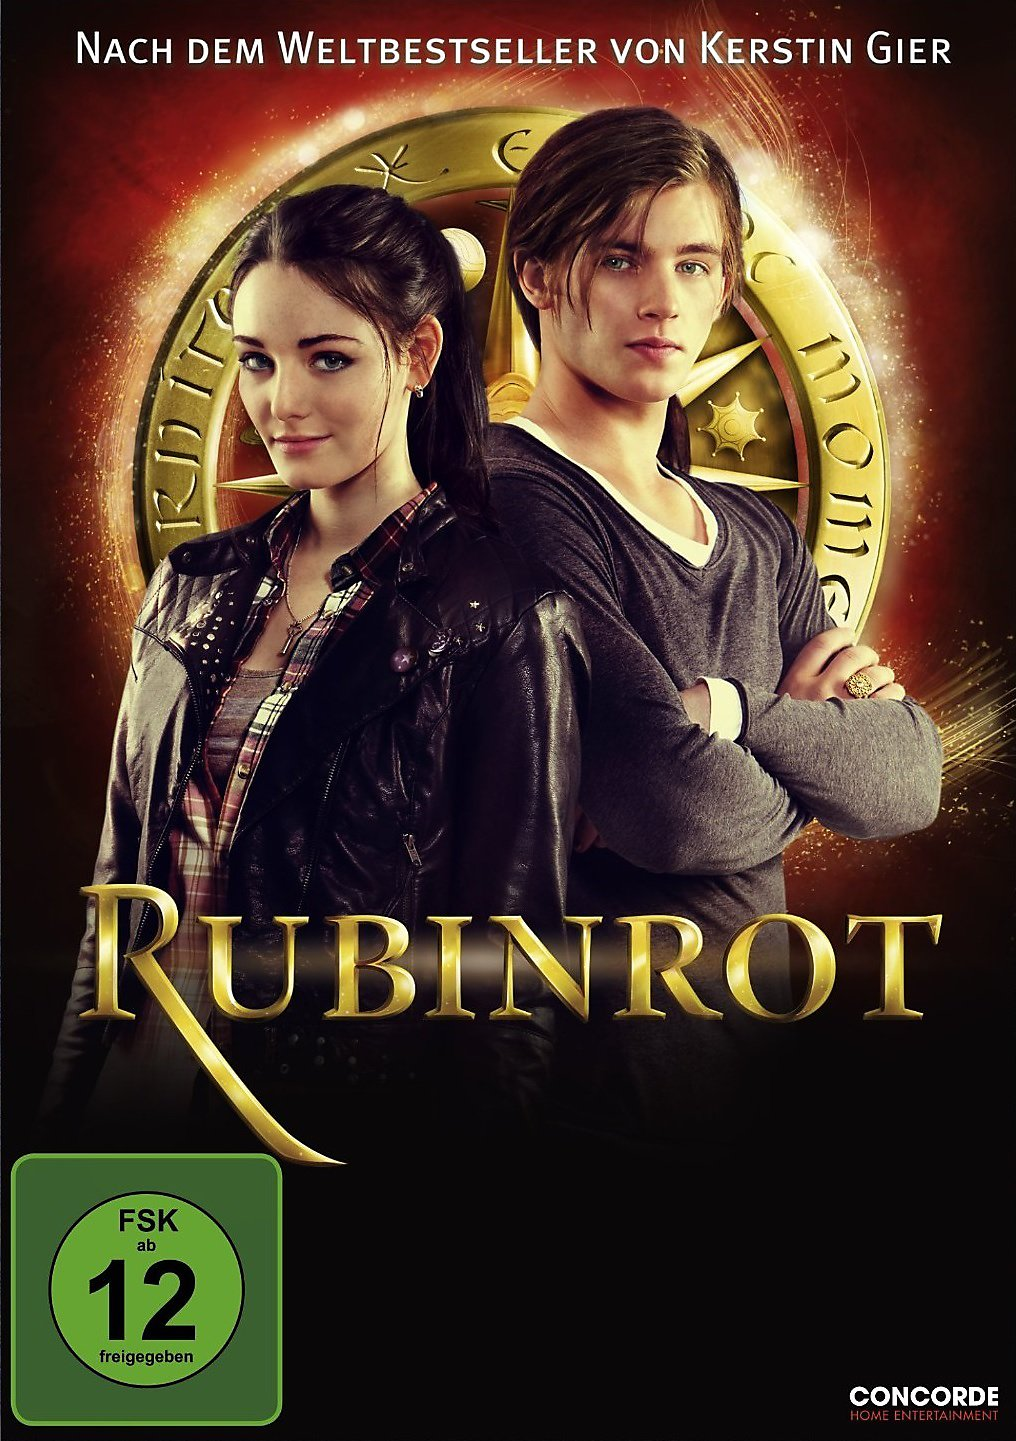 Rubinrot Film Auf Dvd Jetzt Bestellen Bei Weltbildde